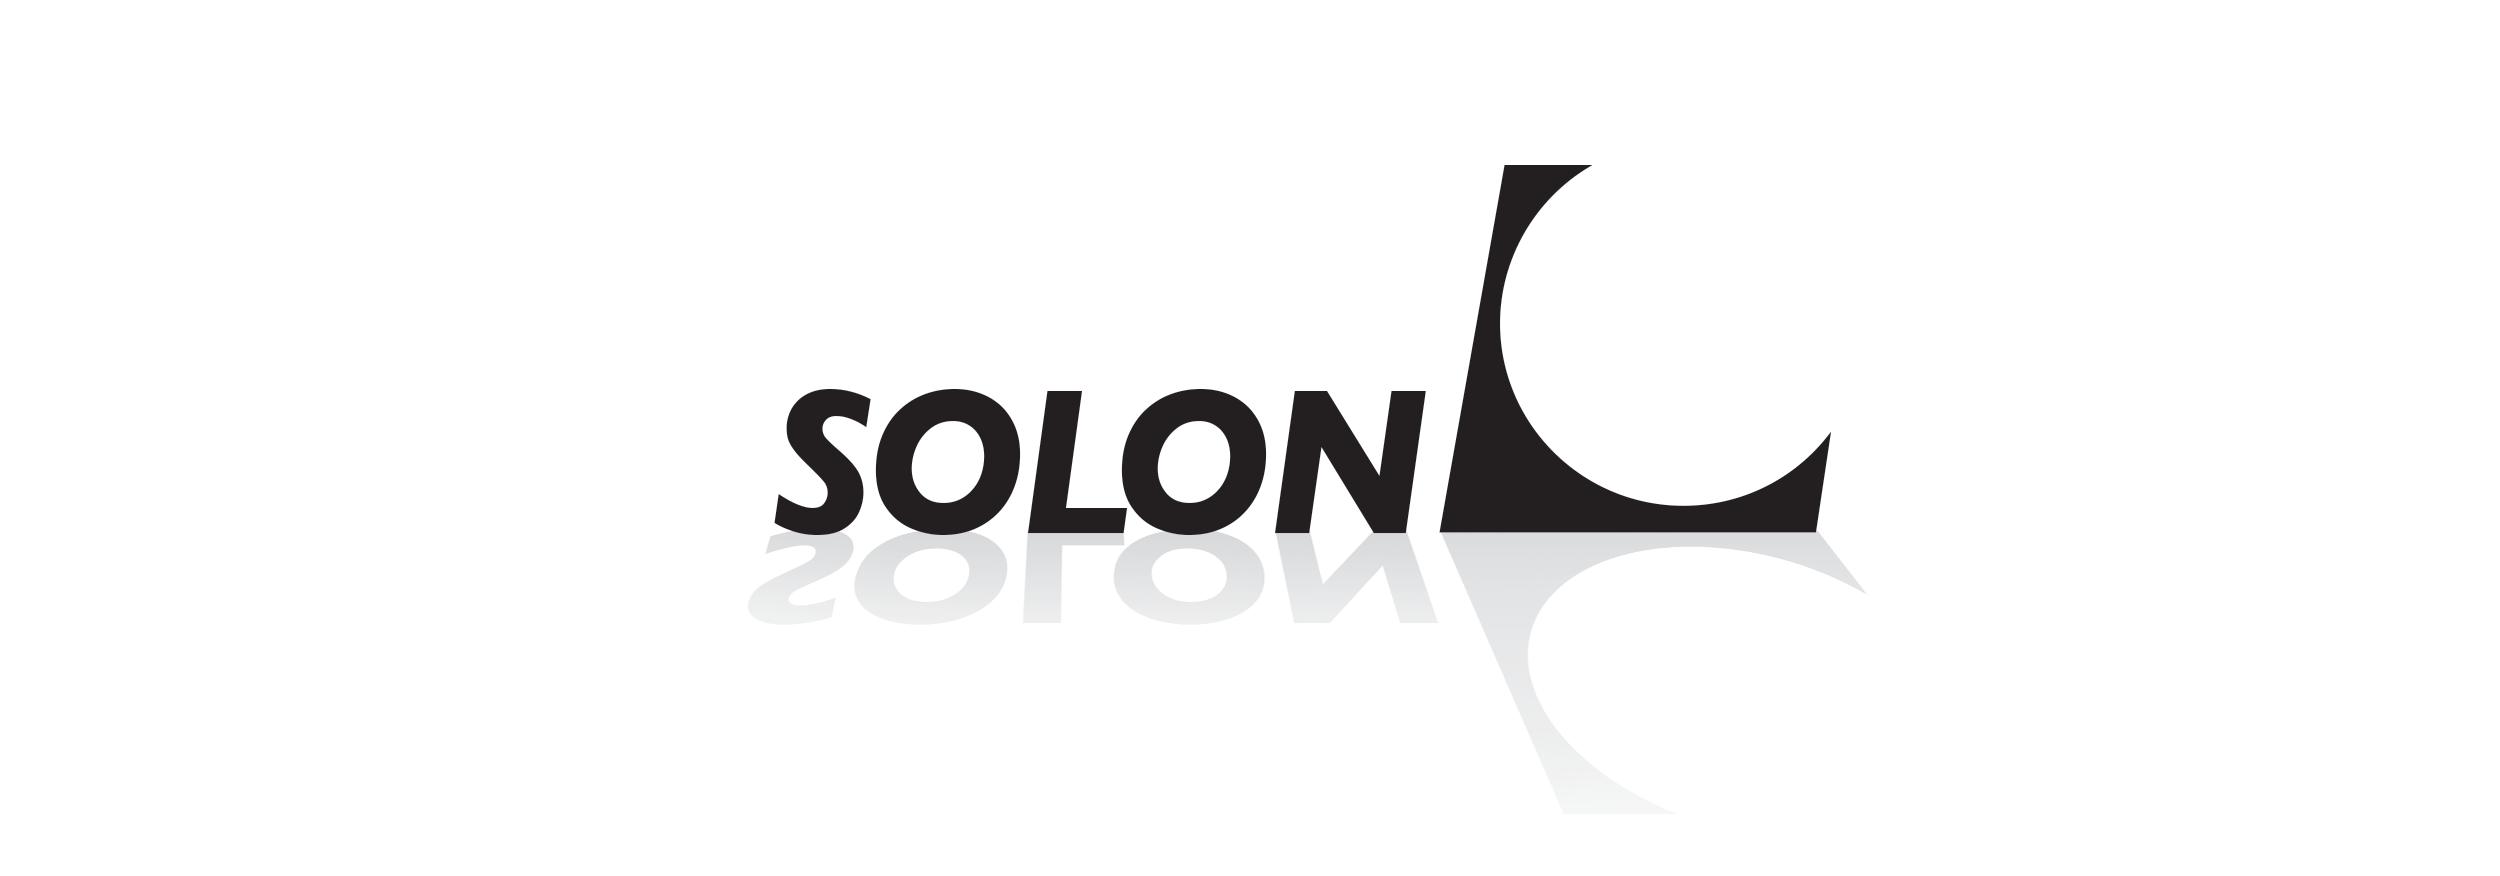 SolonWebN.png